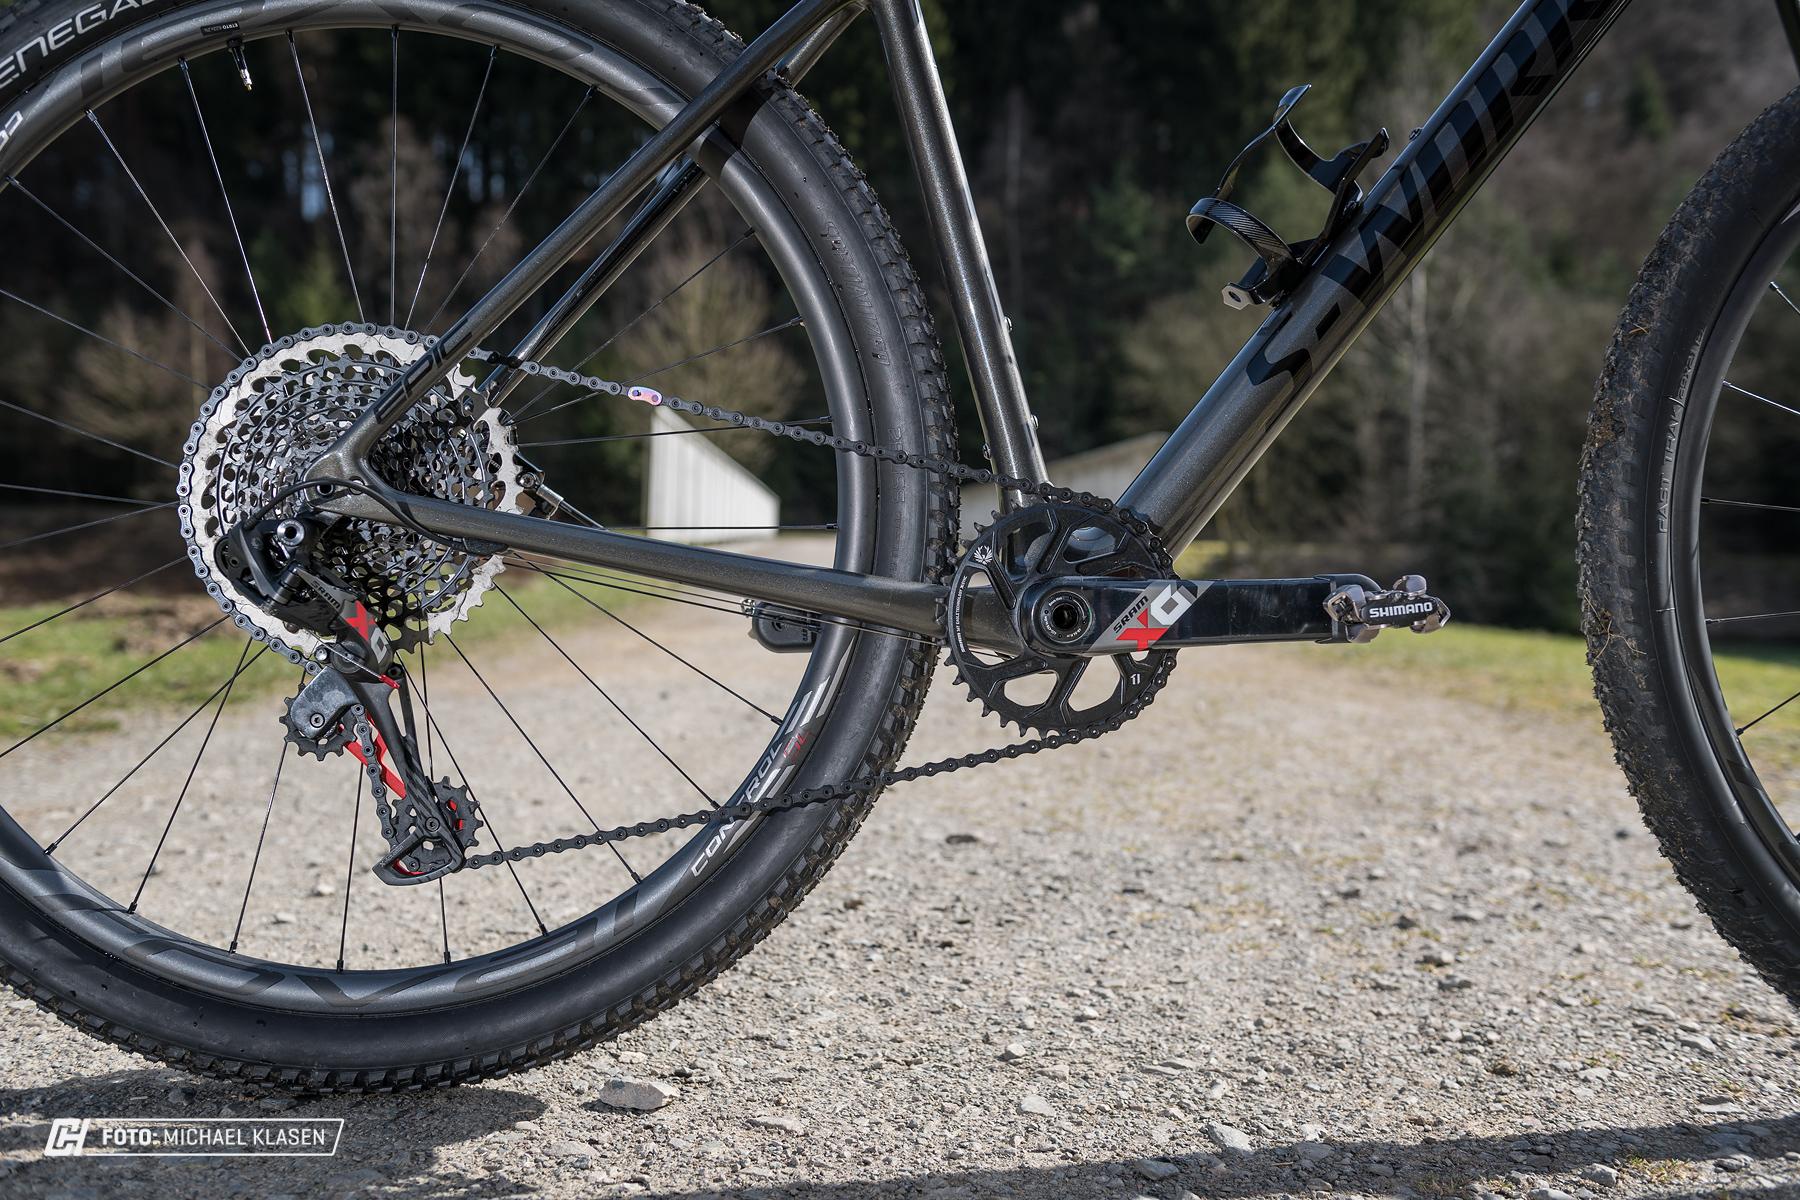 MIK 8213 Cycleholix